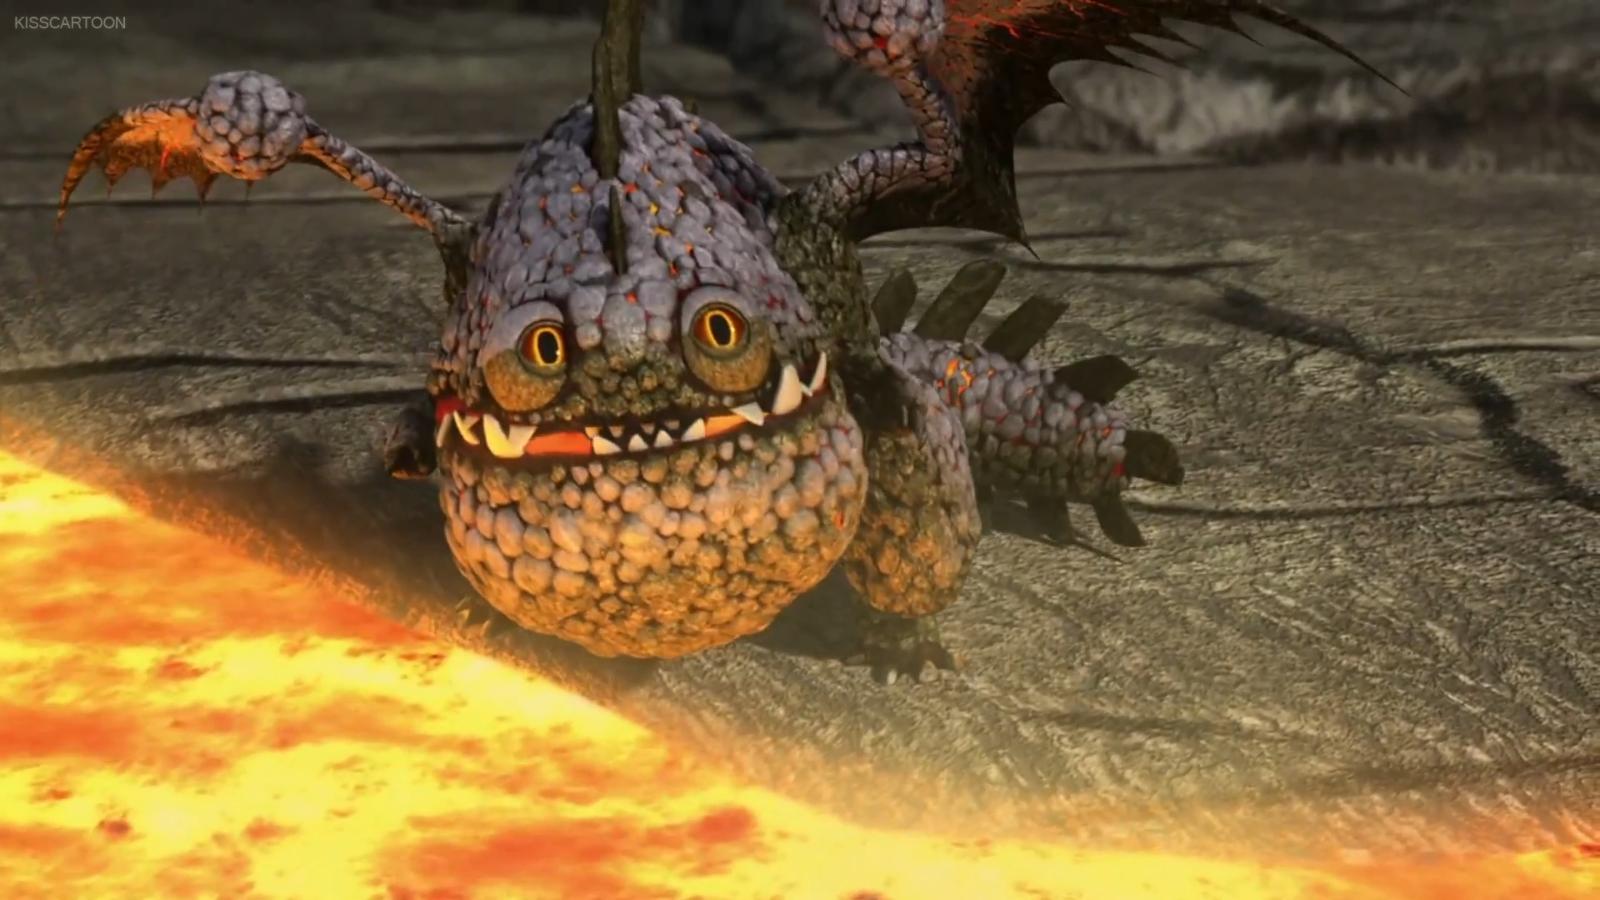 окрашены дракон объедало картинка мораес выиграл